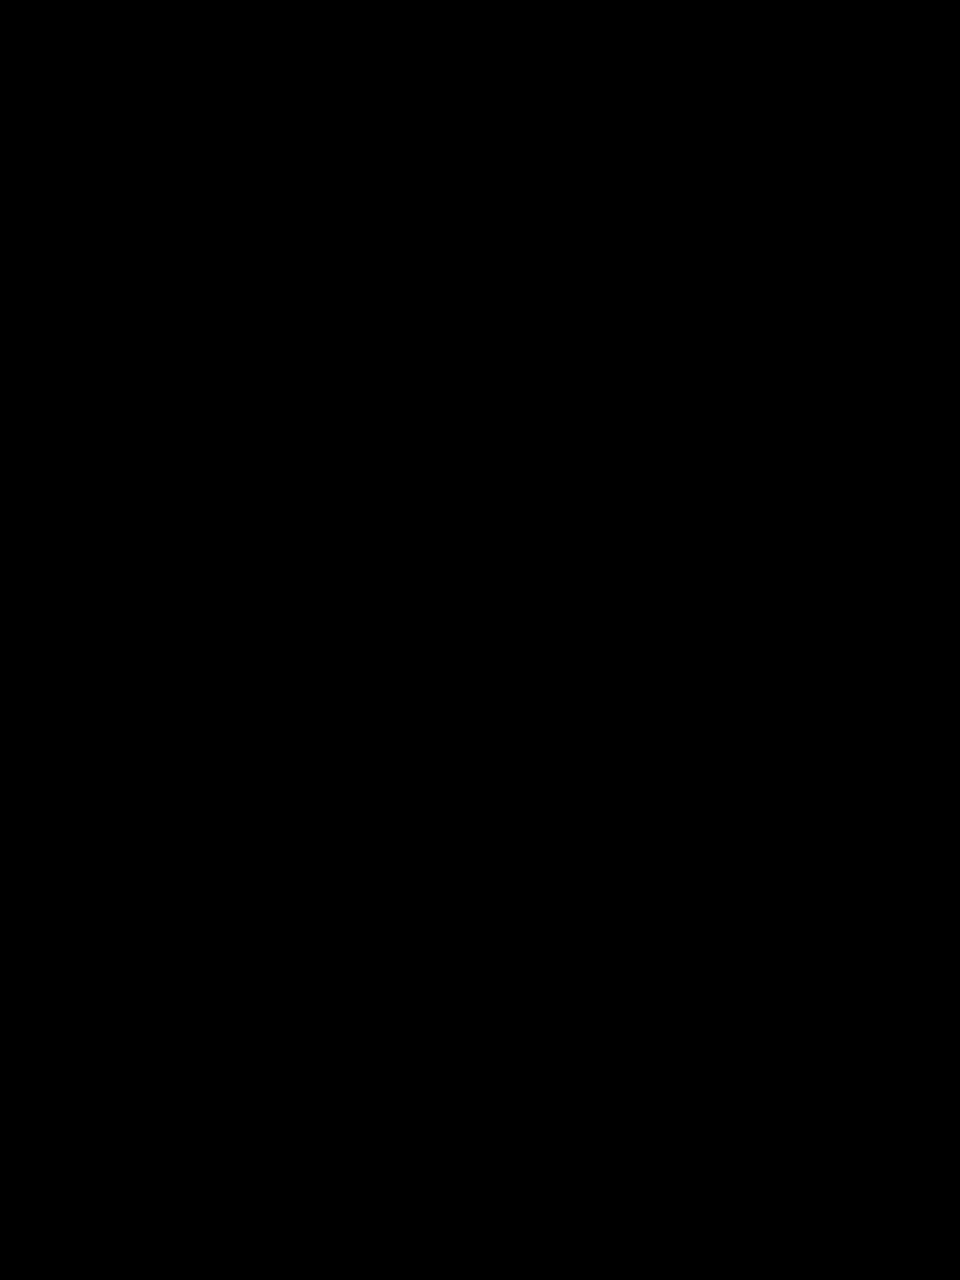 [Atelier Hachifukuan] Superheroine Yuukai Ryoujoku III - Superheroine in Distress [Chrome Rose Bell]   凌辱诱拐3 [Chinese] [有条色狼汉化] 33